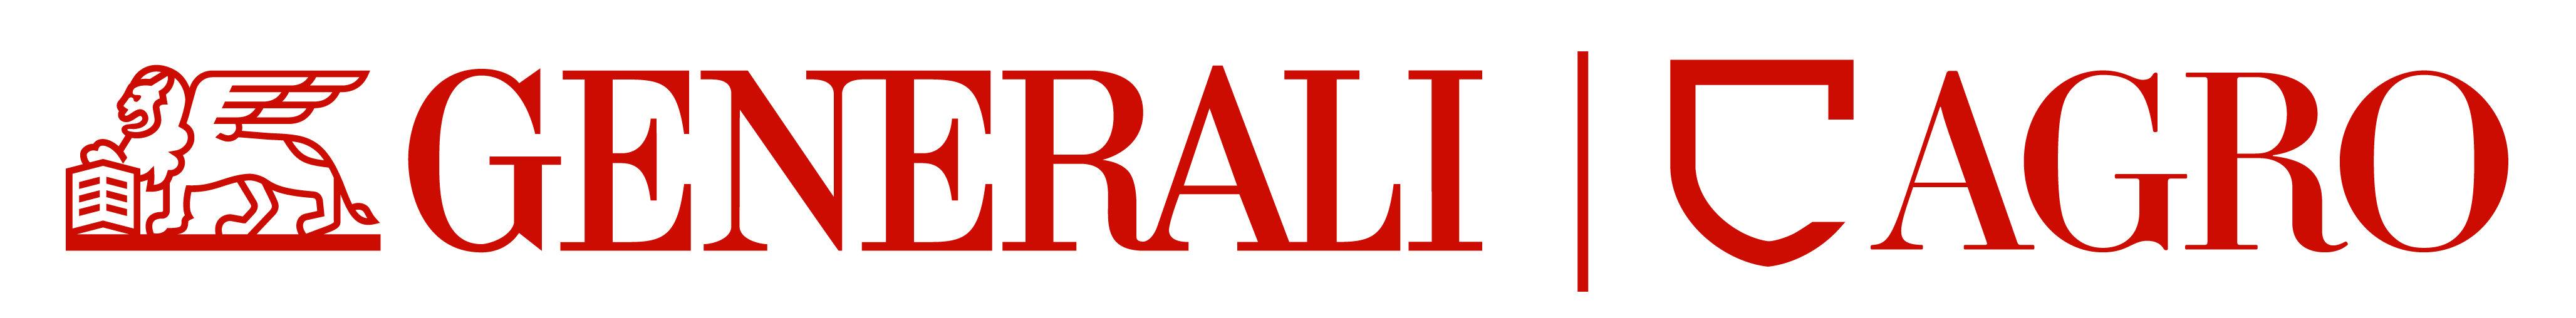 Generali Agro logo poziom CMYK